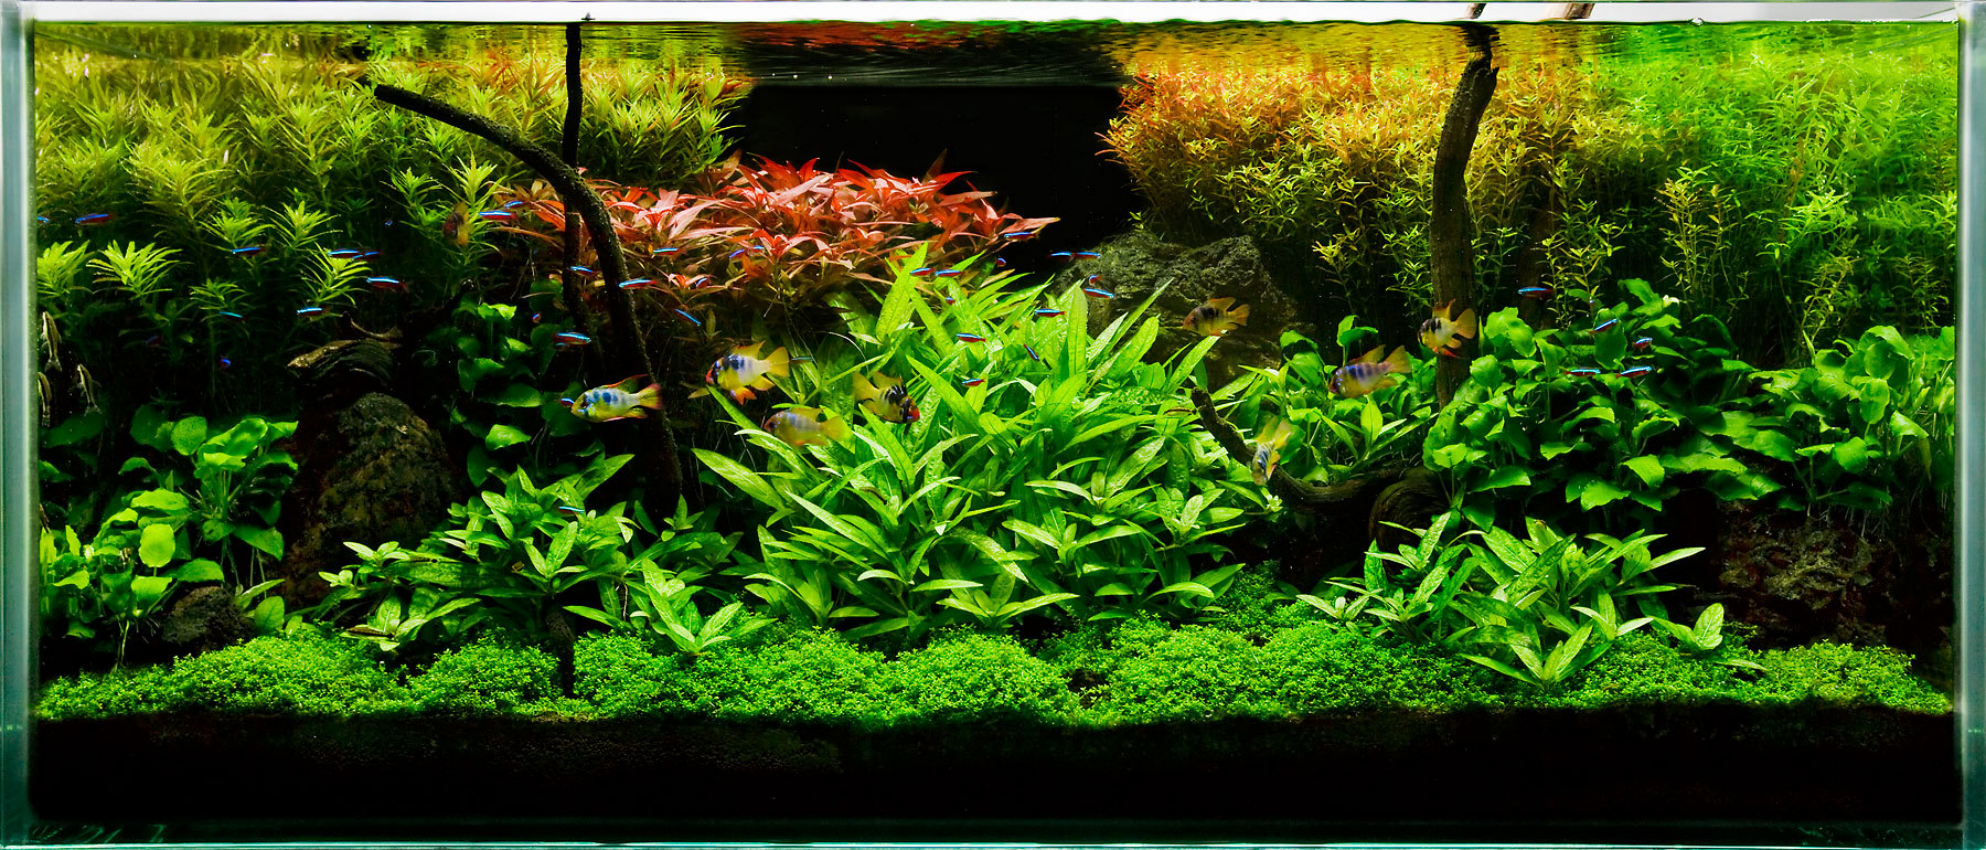 Freshwater aquarium fish tank maintenance - The Key To A Successful Planted Fish Tank Aquarium